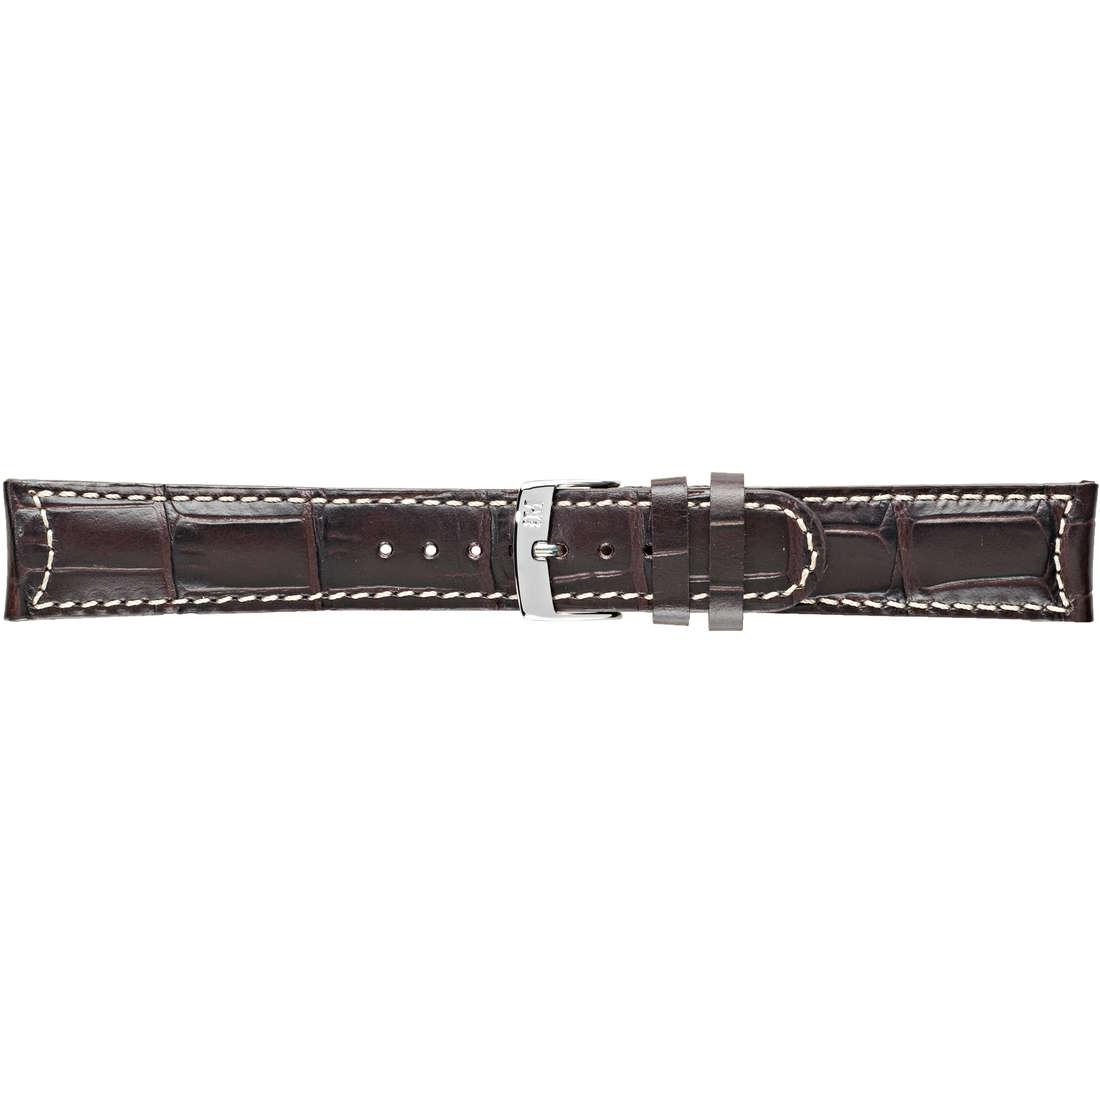 watch watch bands watch straps man Morellato Manufatti A01U3882A59030CR20